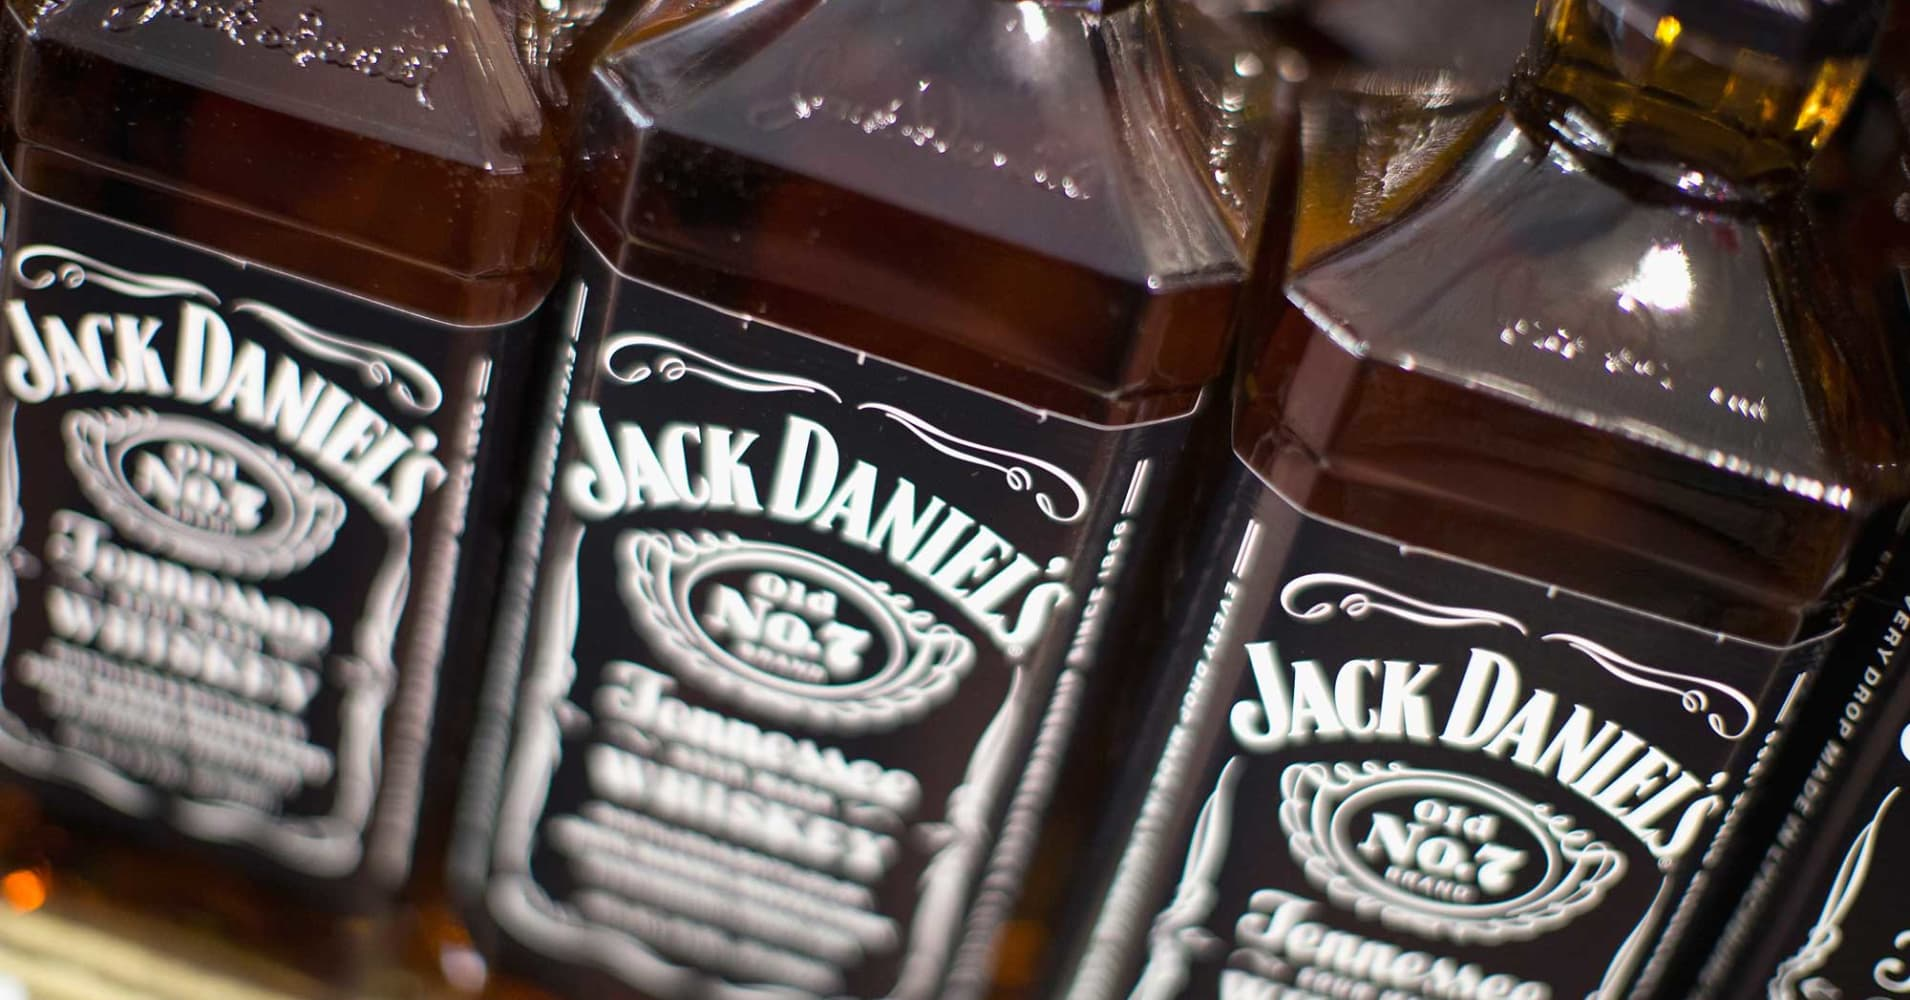 Canada tariffs on US begin Sunday, targeting whiskey, ketchup and soup